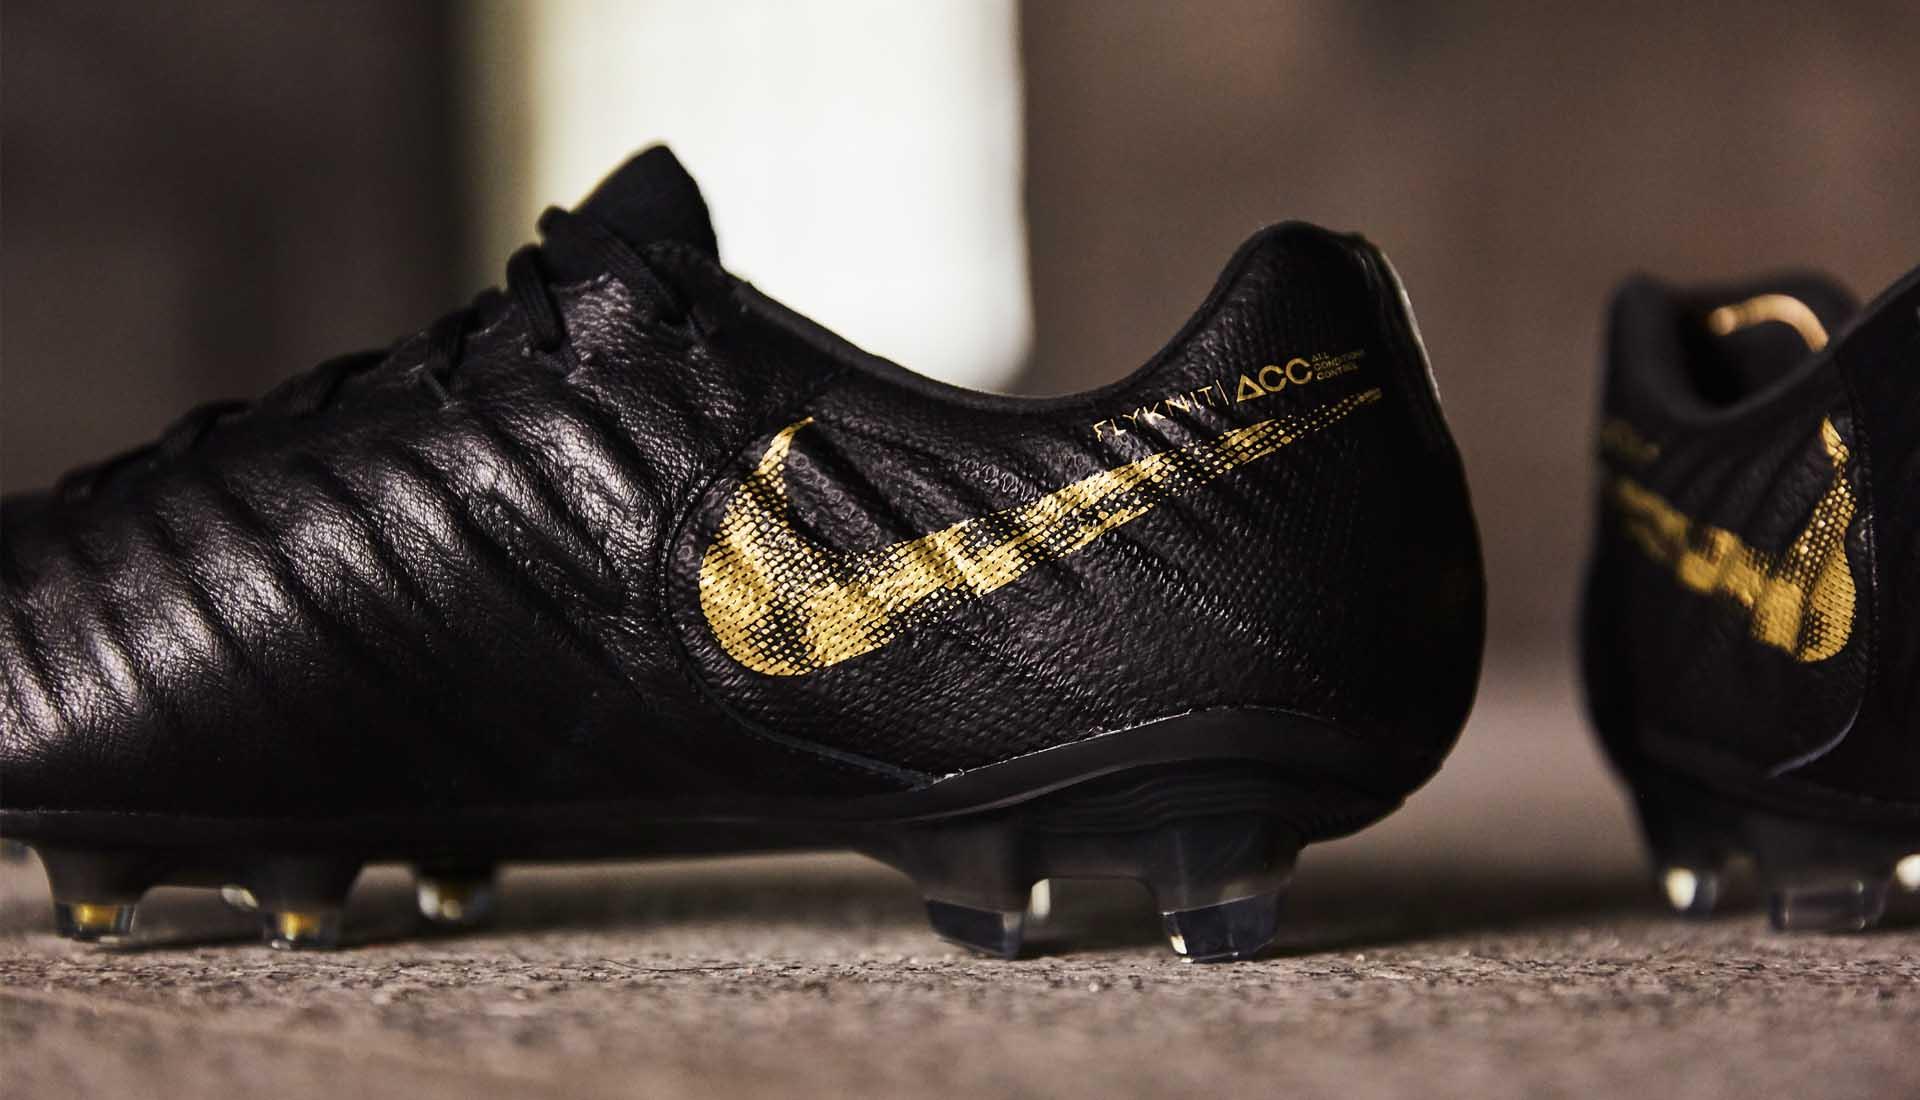 scarpe calcio nike black lux pack